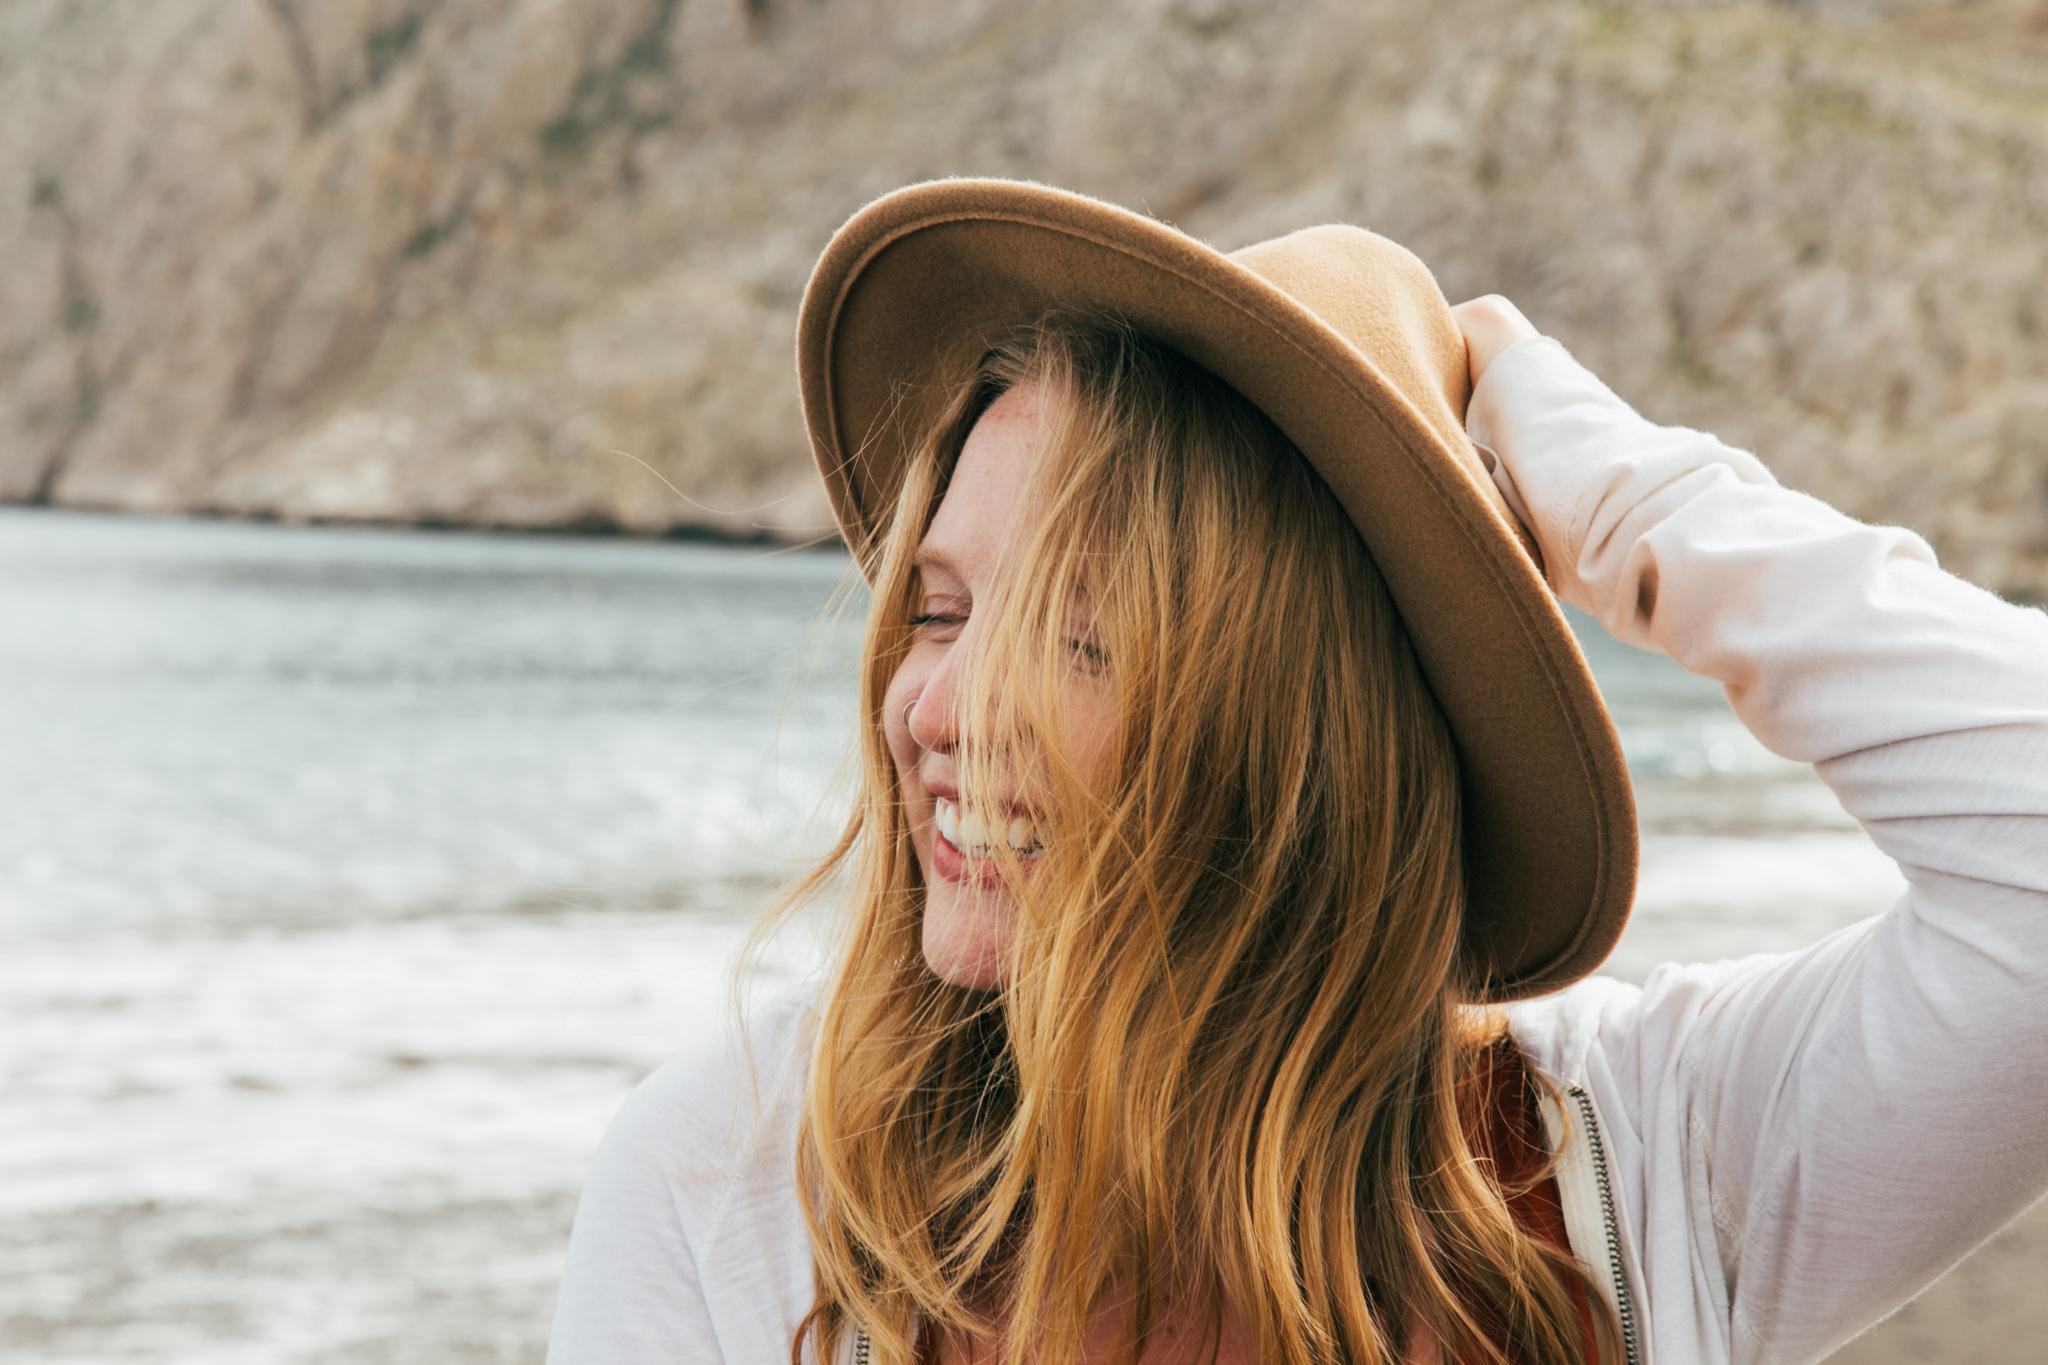 self esteem-self confidence-body image-self love-empowerment definition